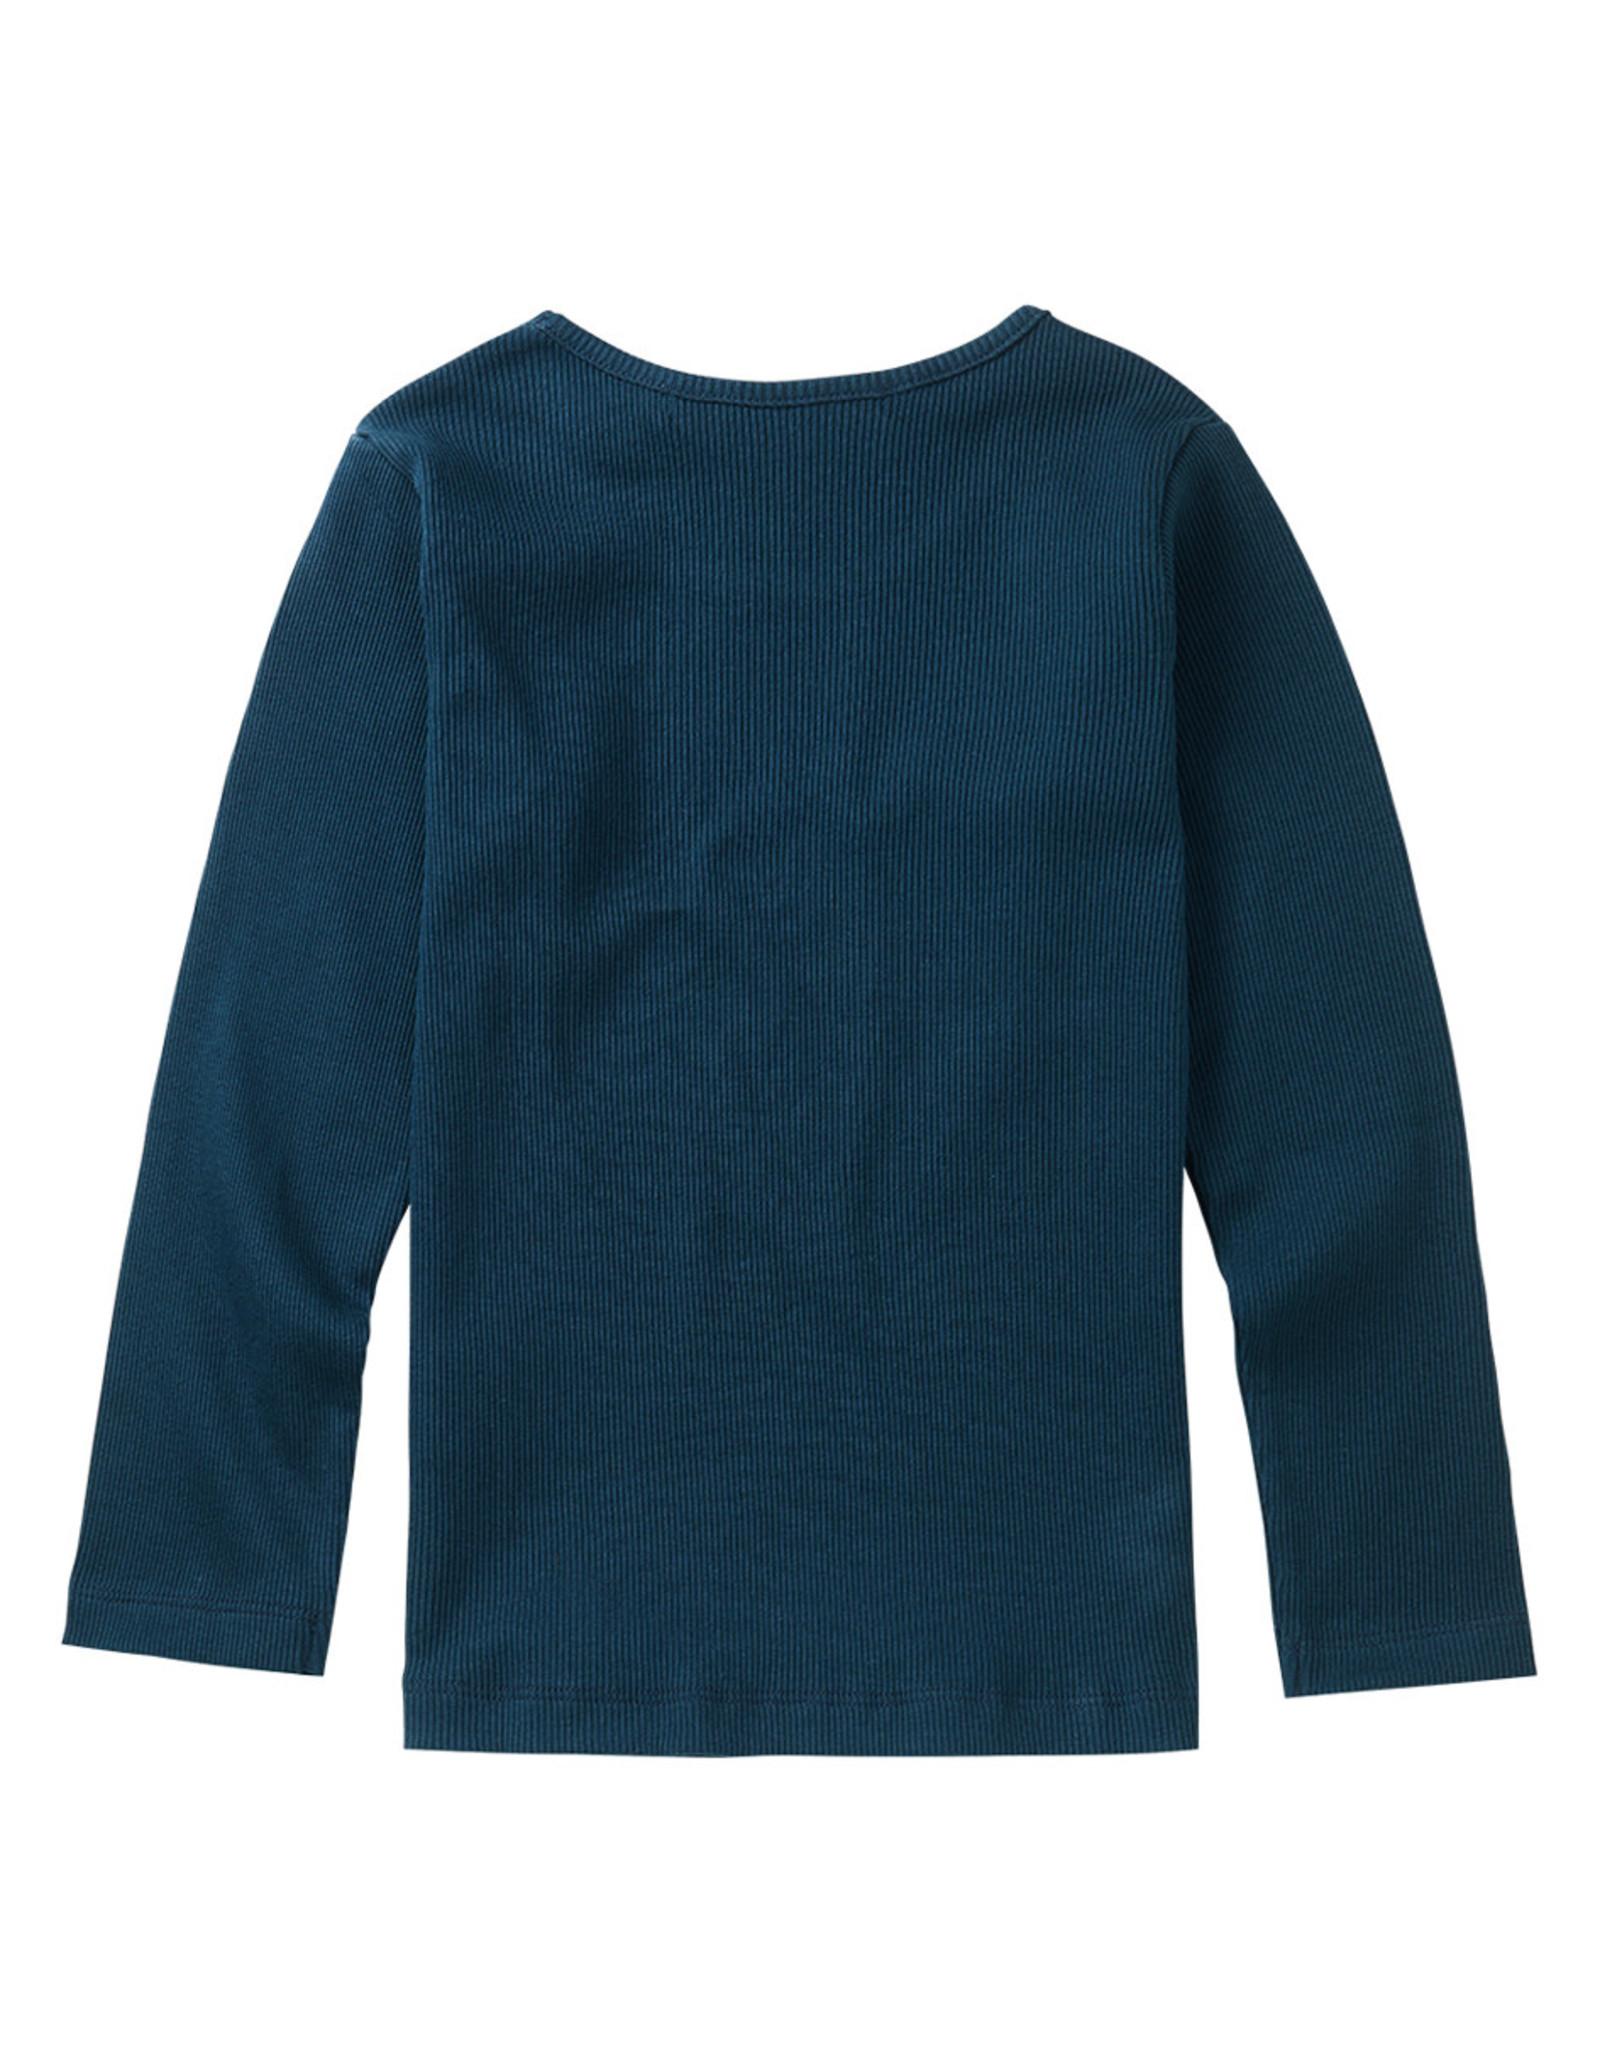 Mingo Longsleeve Teal Blue (rib)